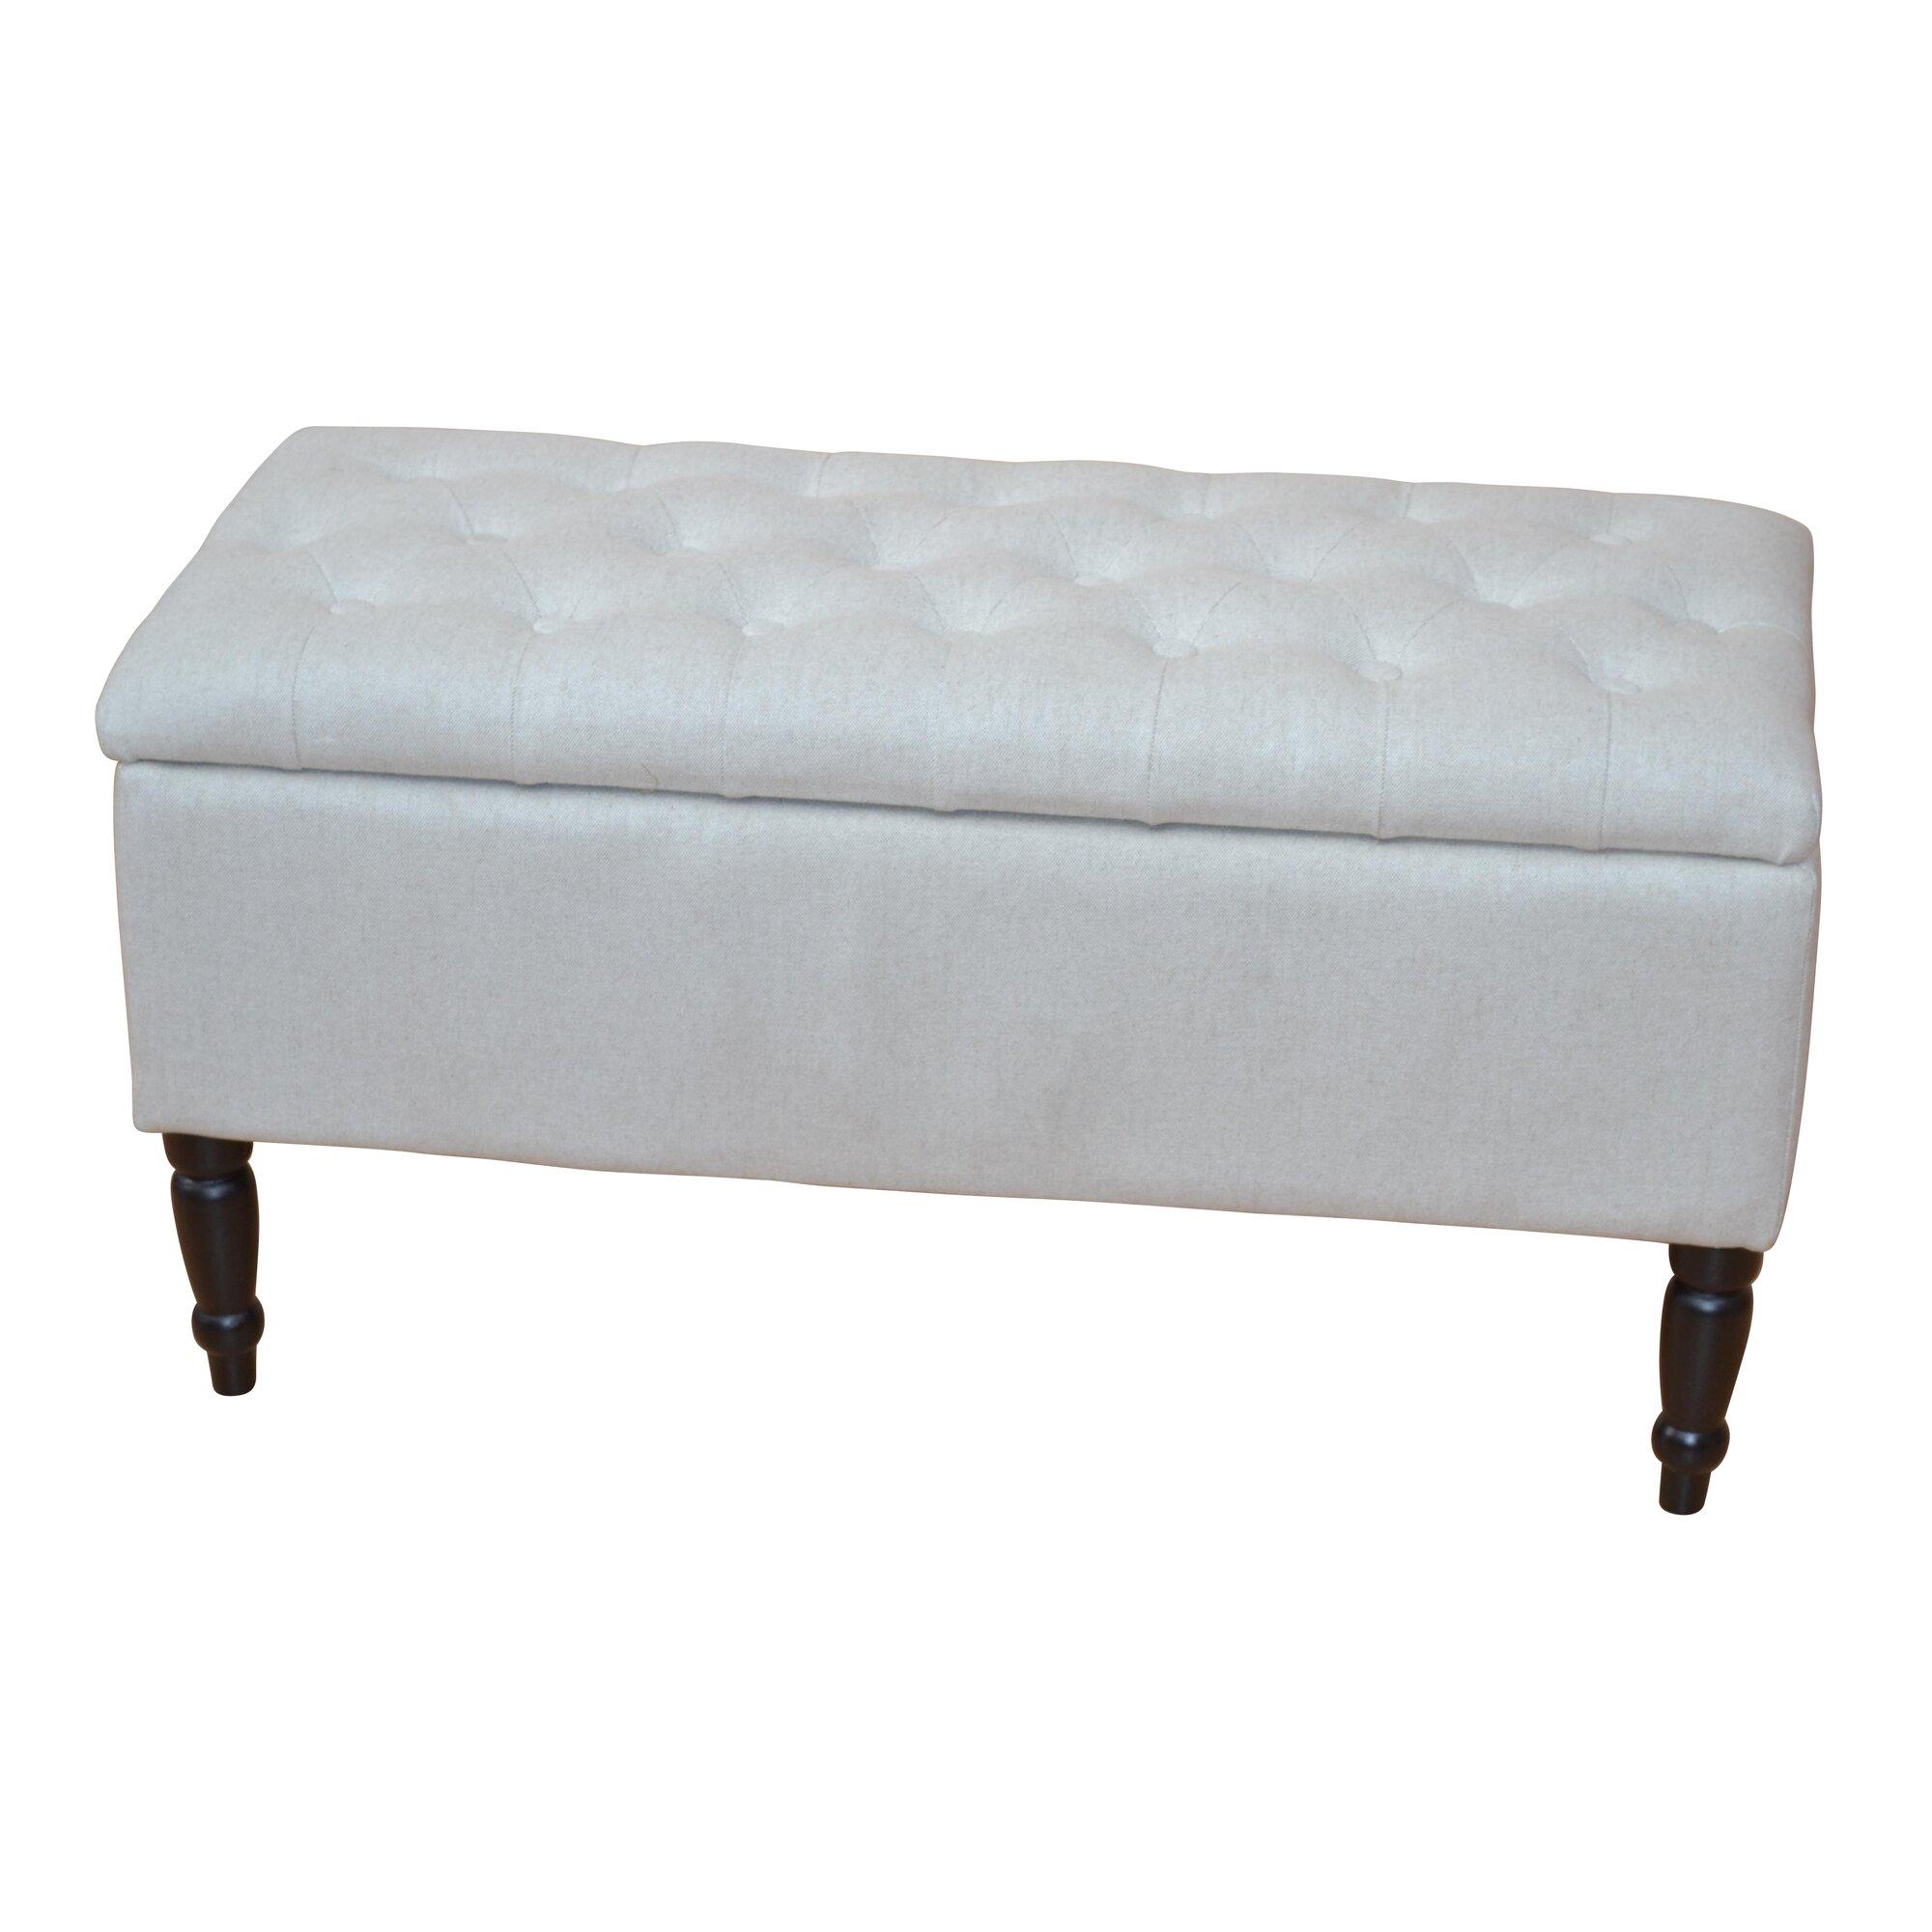 home haus gepolsterte schlafzimmerbank jenny mit. Black Bedroom Furniture Sets. Home Design Ideas